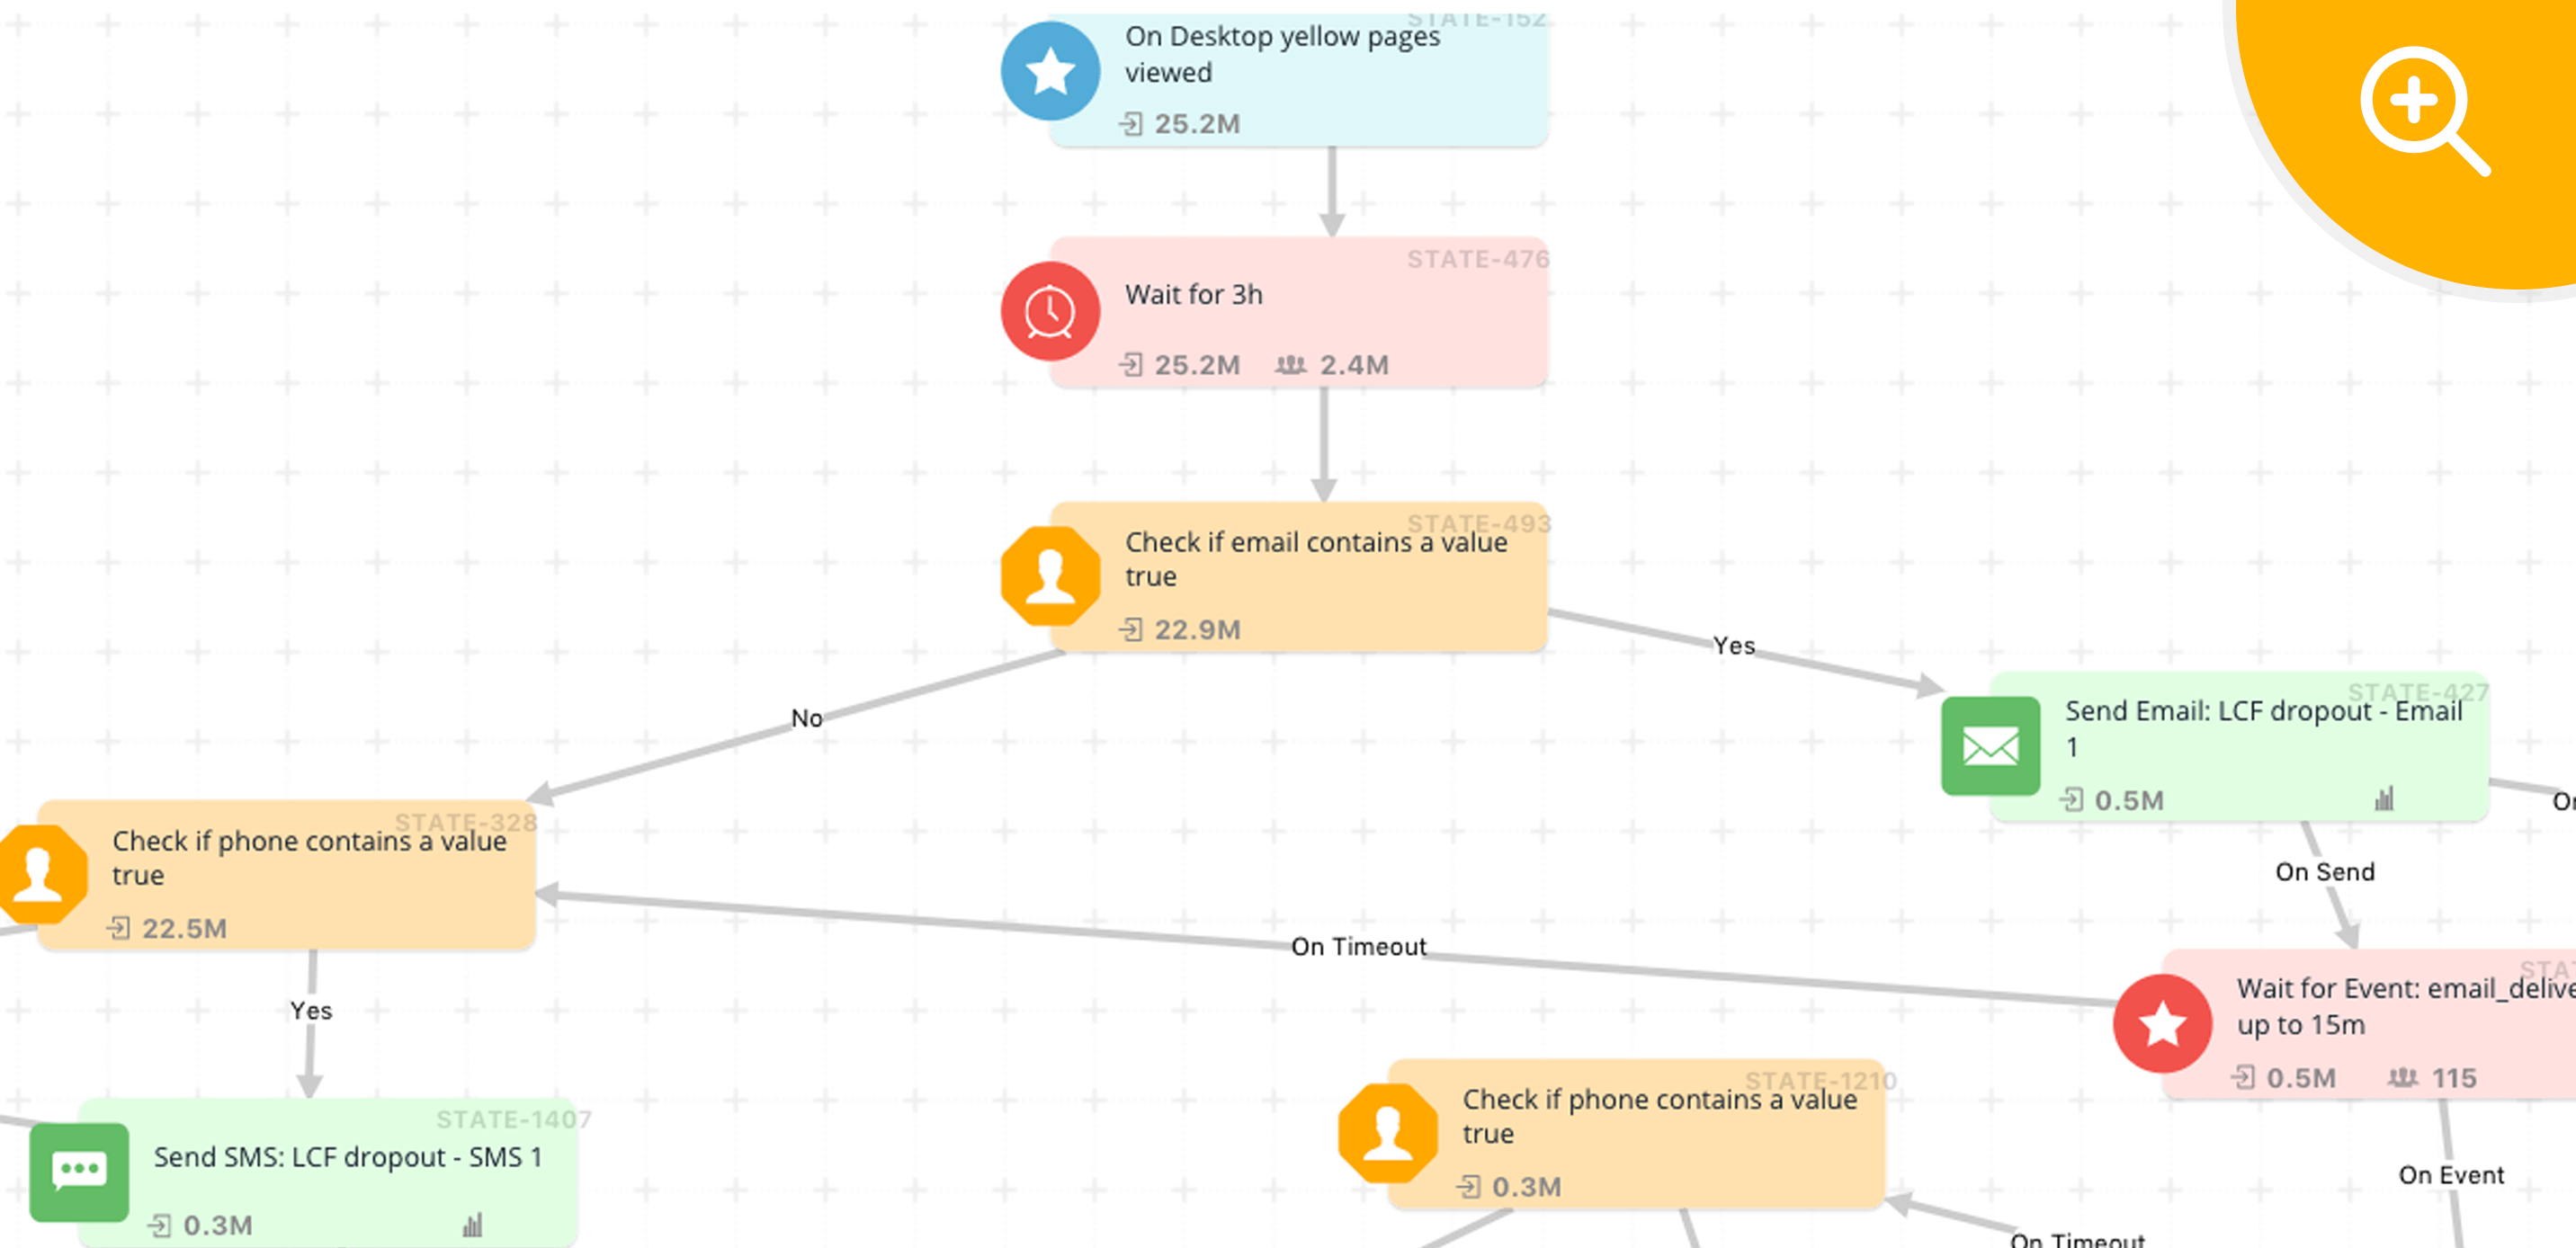 Multiple User Engagement Journey Designer & Journey Automation Tool